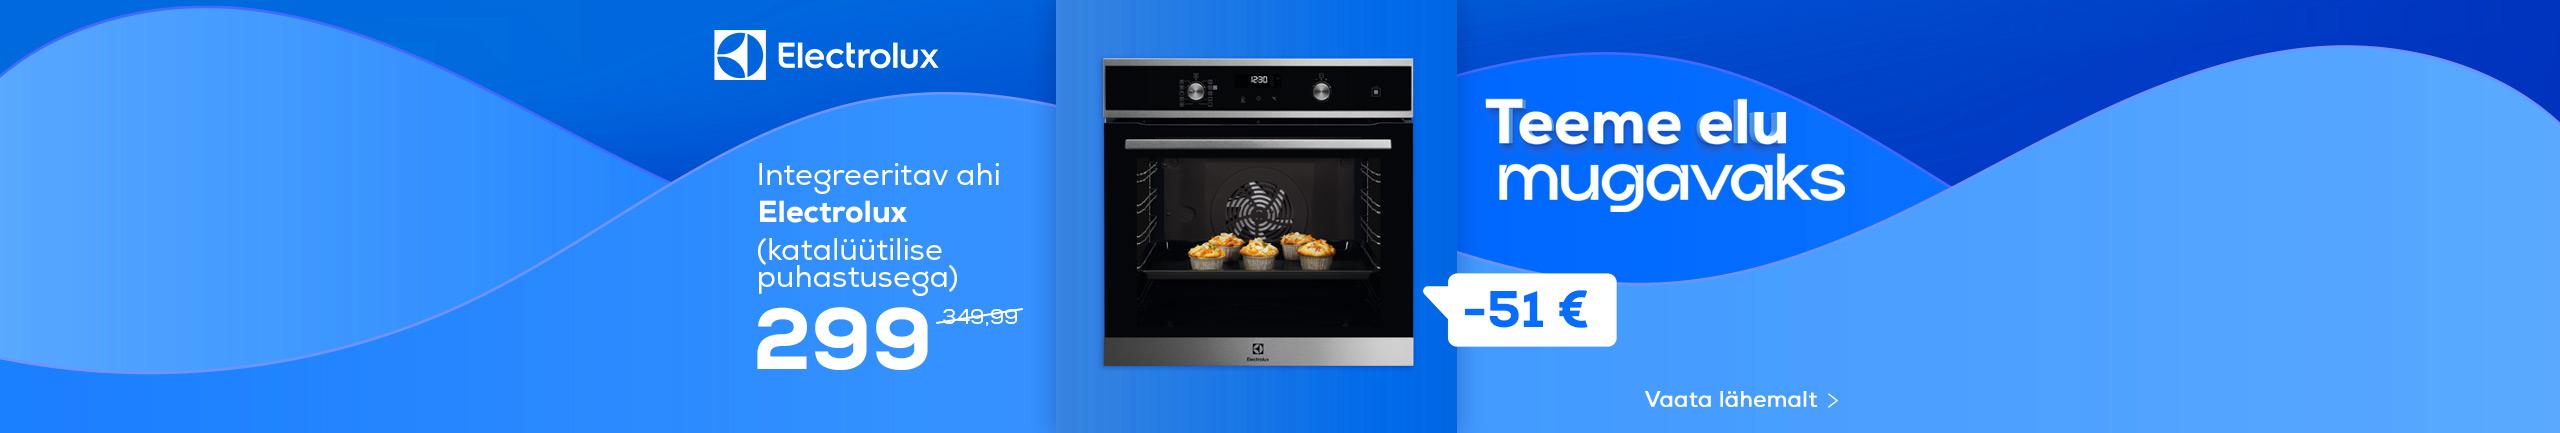 NPL We make life easy! Built-in oven Electrolux